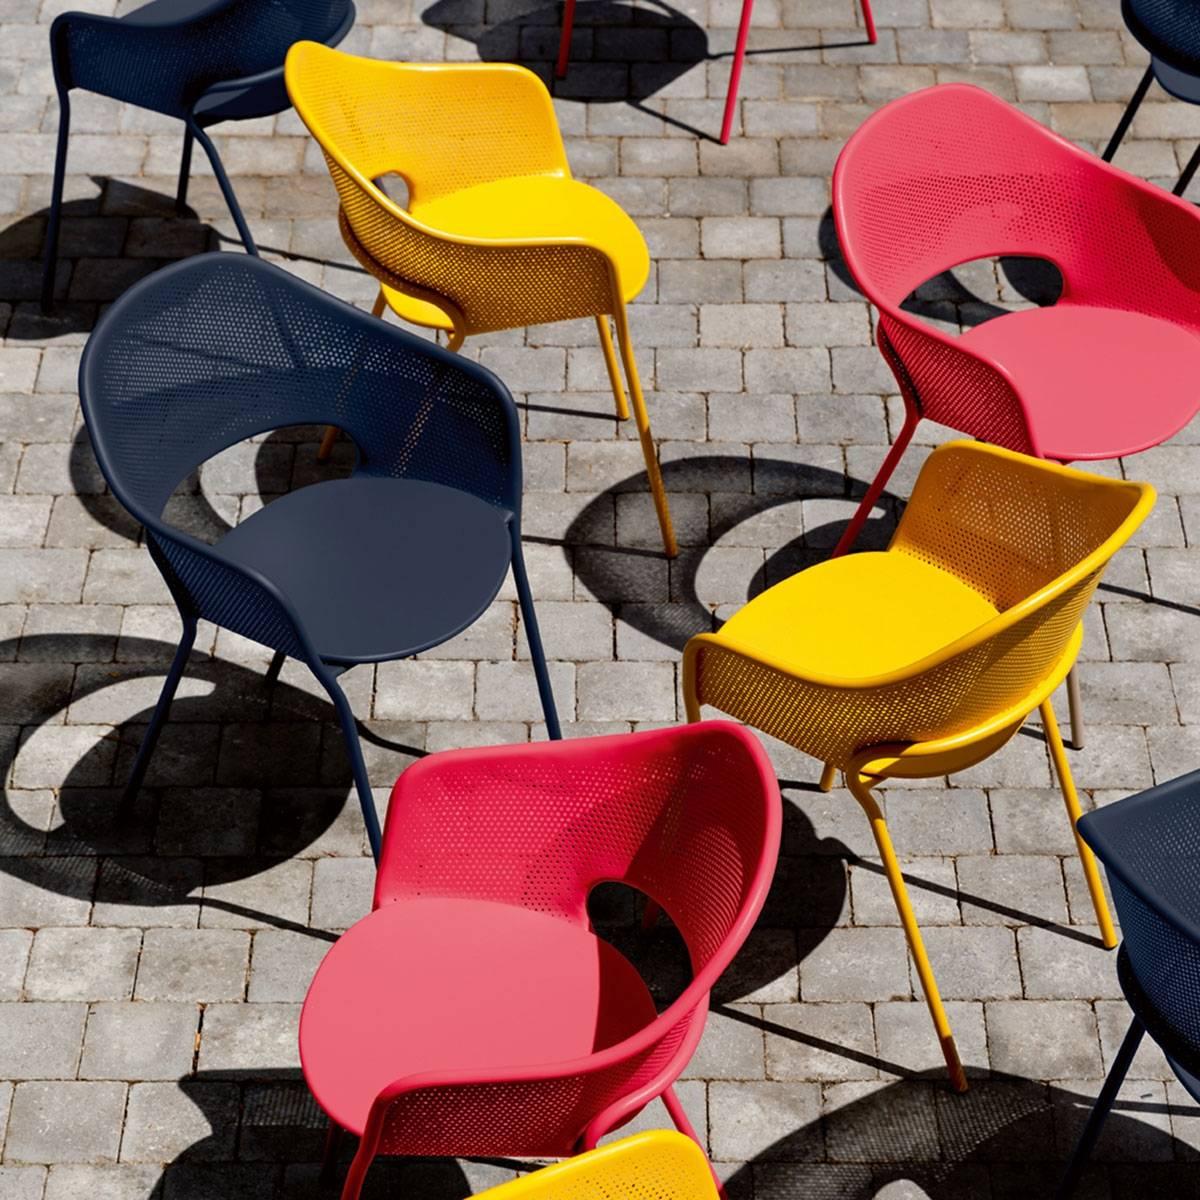 Phenomenal Kate Armchair Kate Collection Jardin Download Free Architecture Designs Grimeyleaguecom